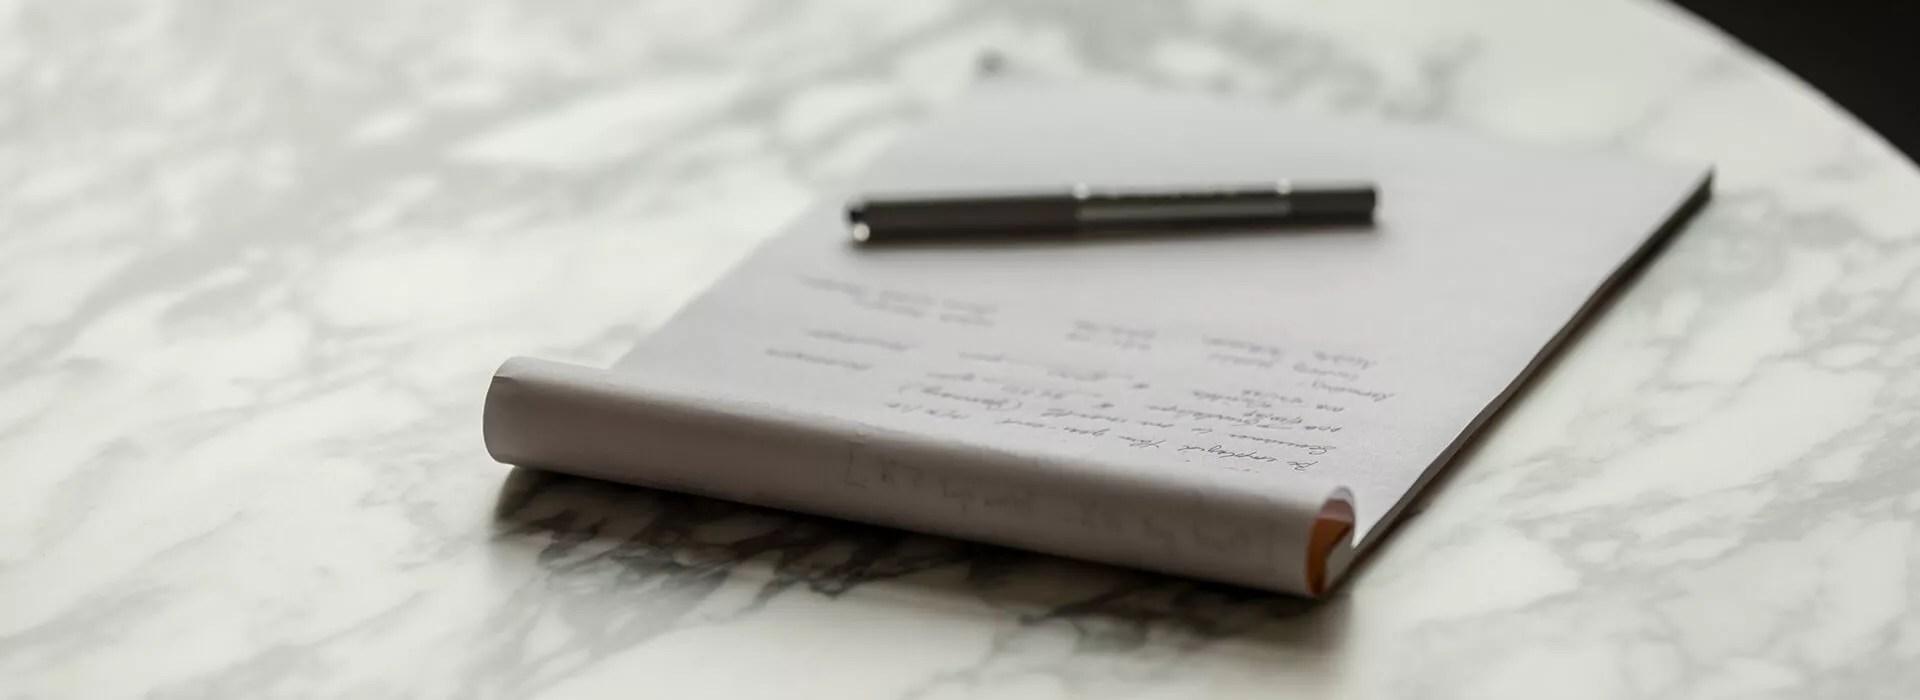 Close up of notepad